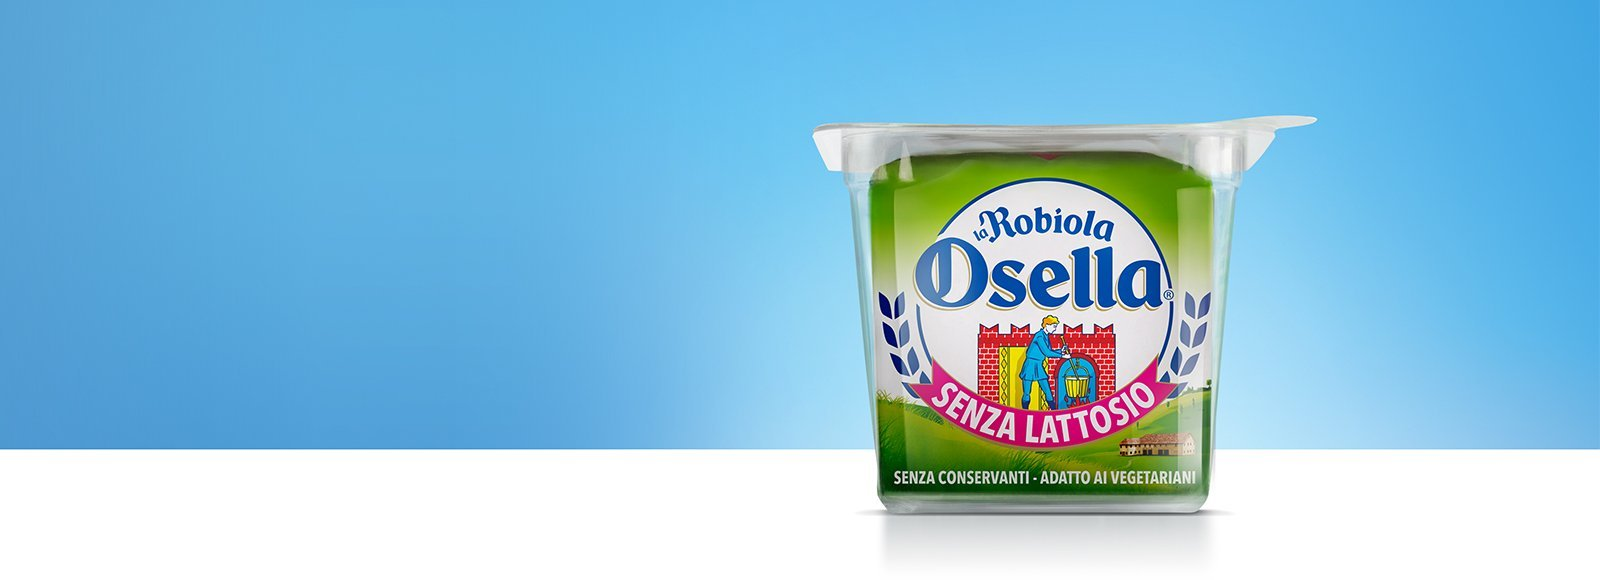 Robiola Osella Lactose Free